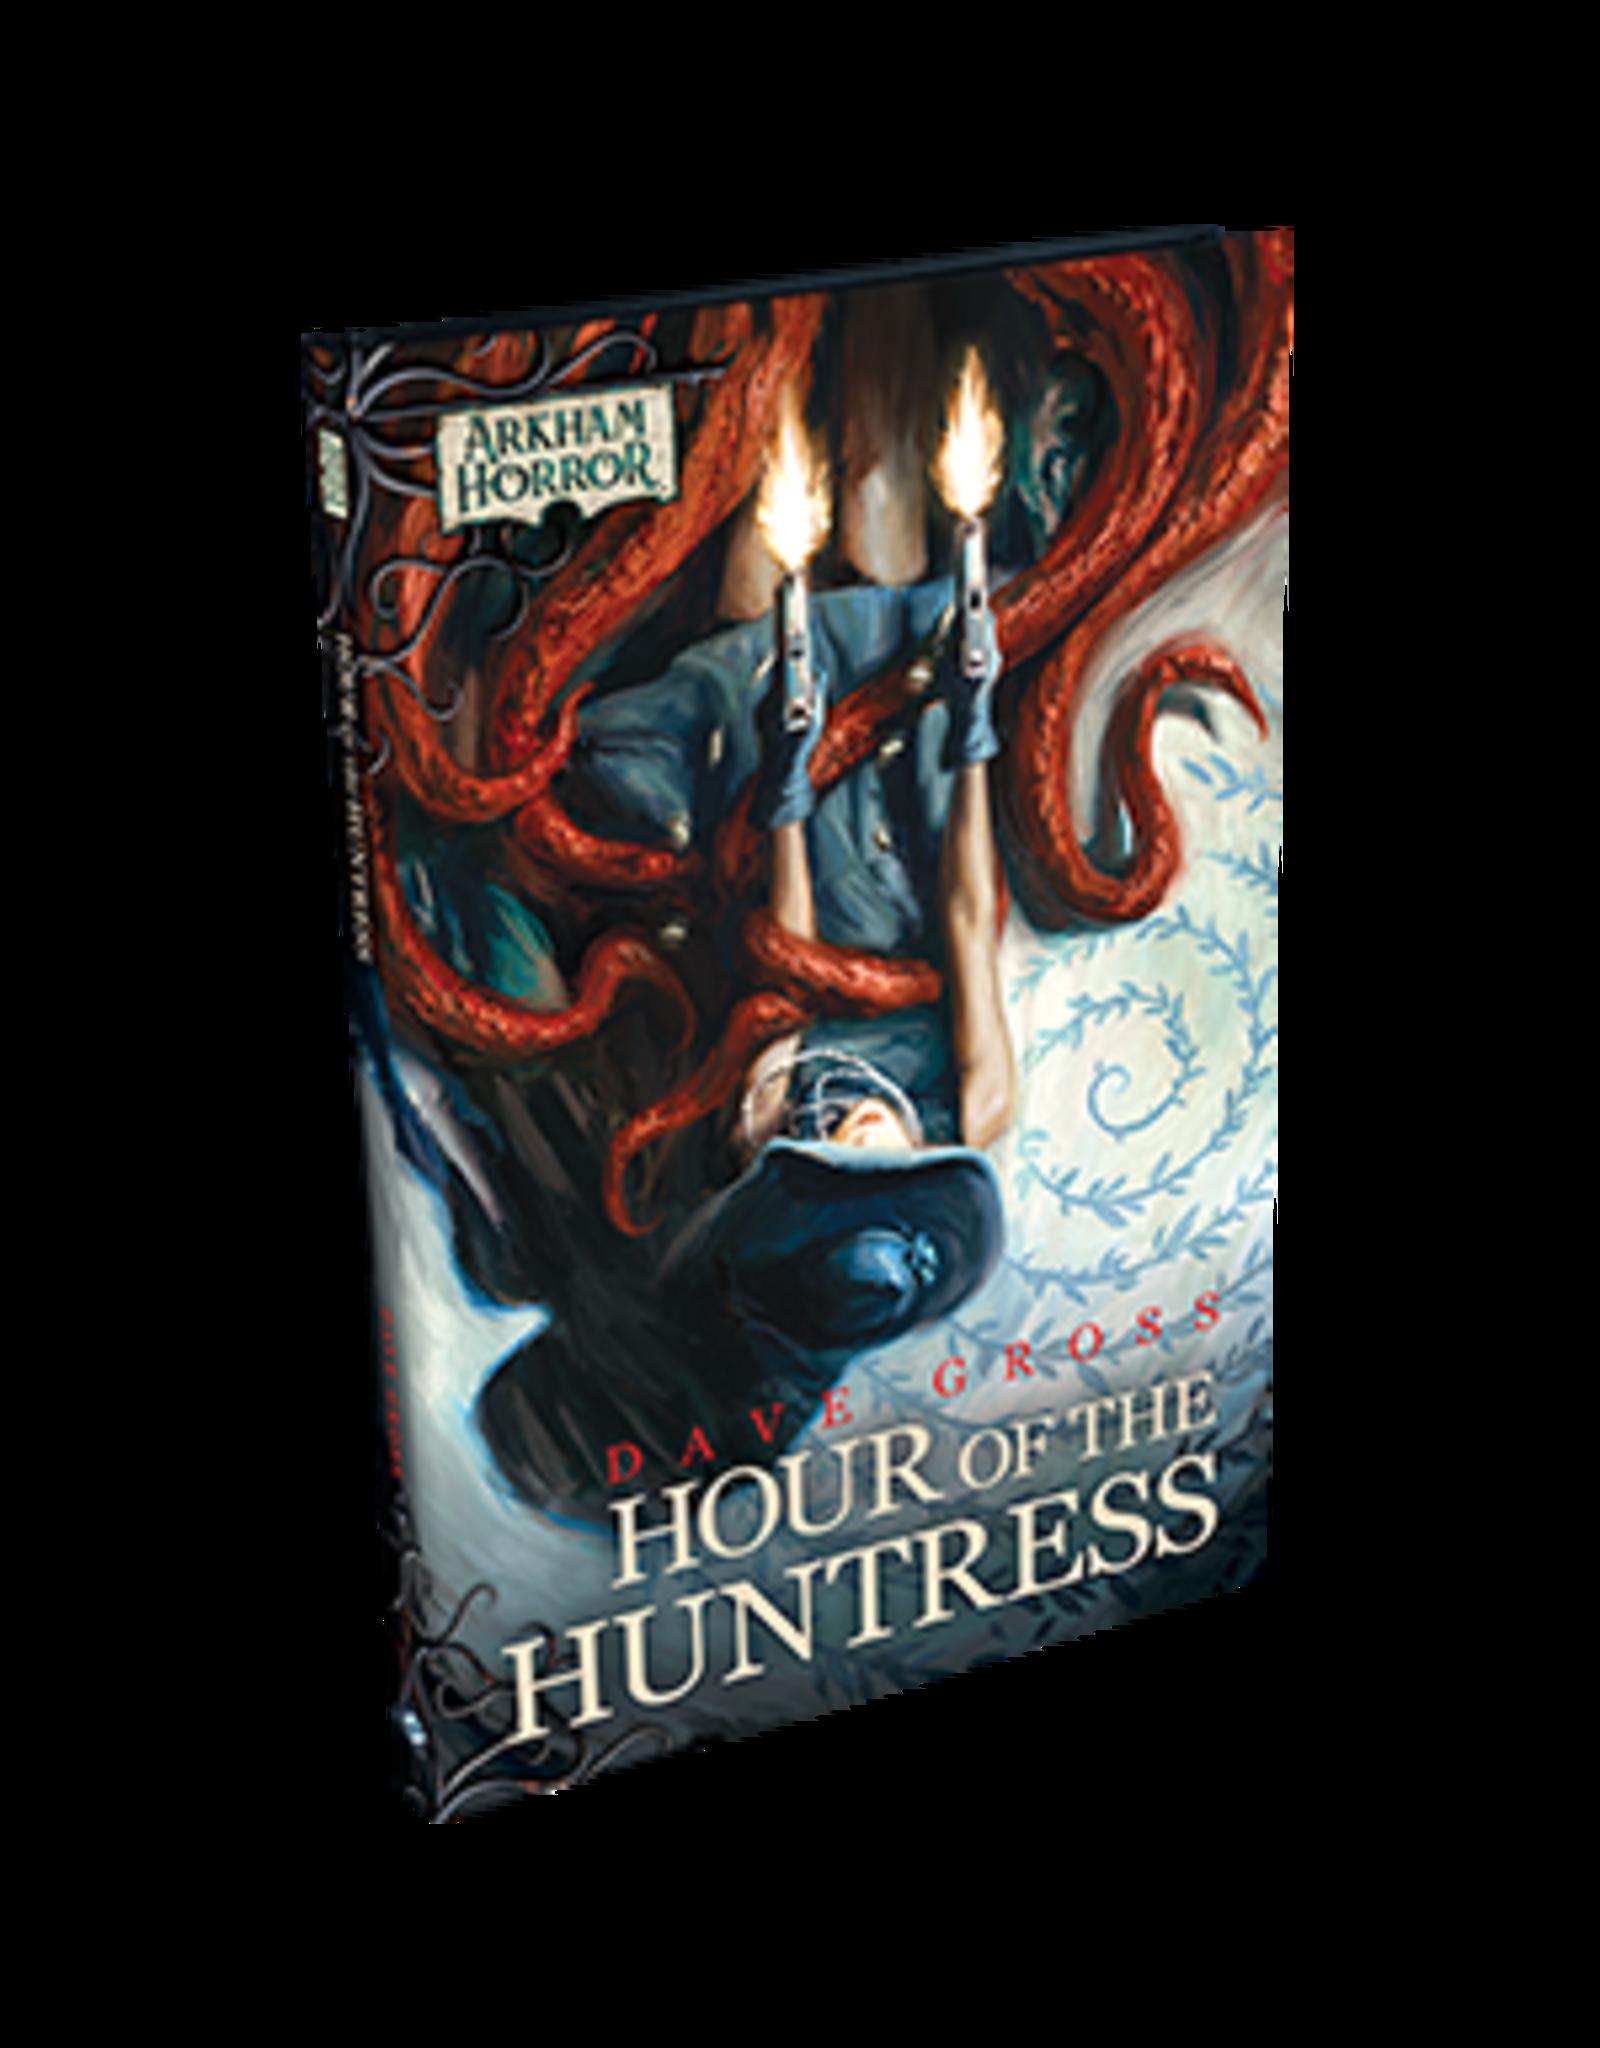 Fantasy Flight Games Arkham Horror - Hour of the Huntress Hardcover